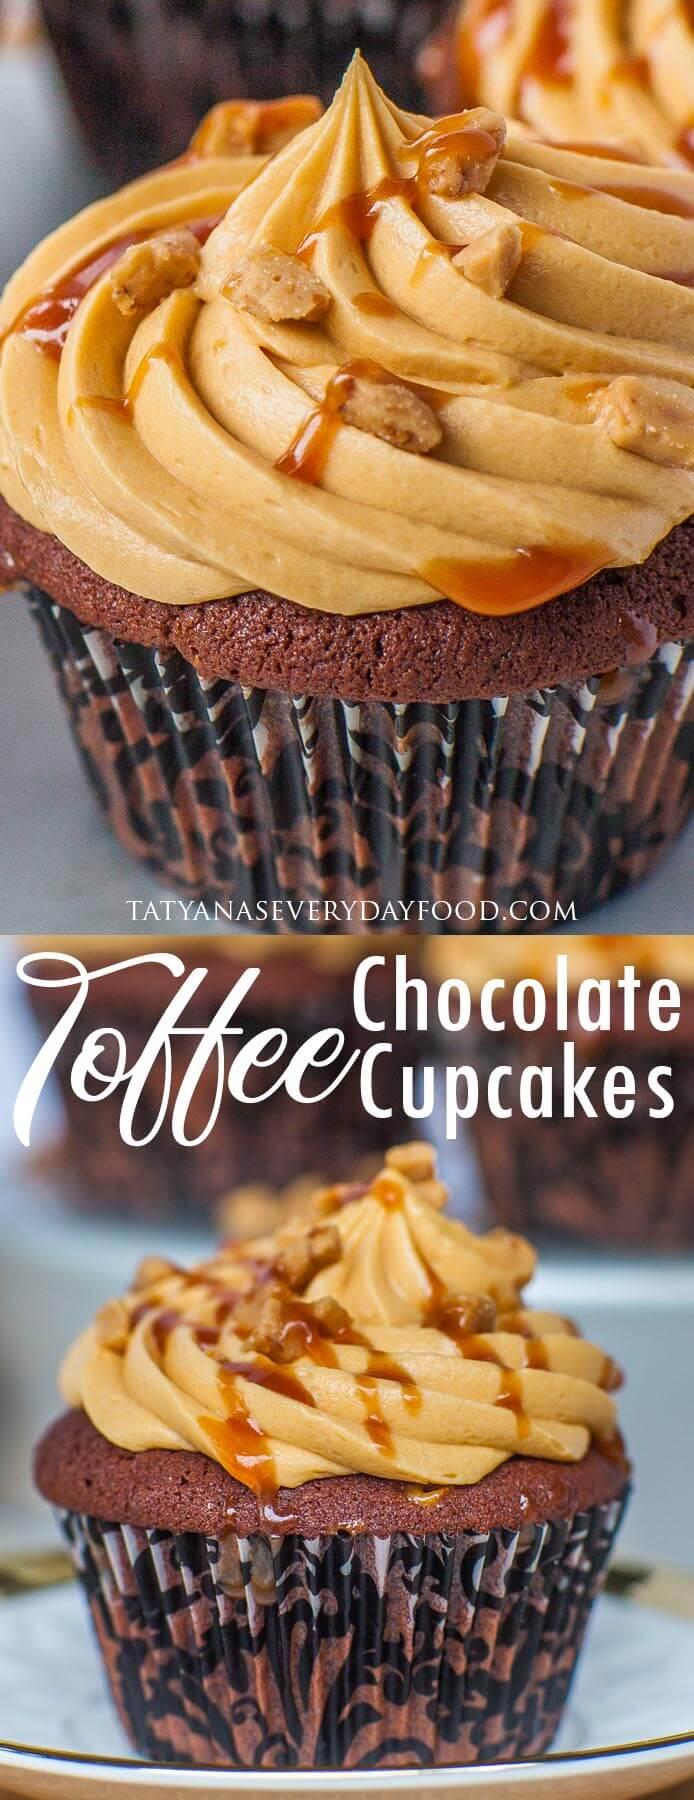 Chocolate Toffee Cupcakes video recipe